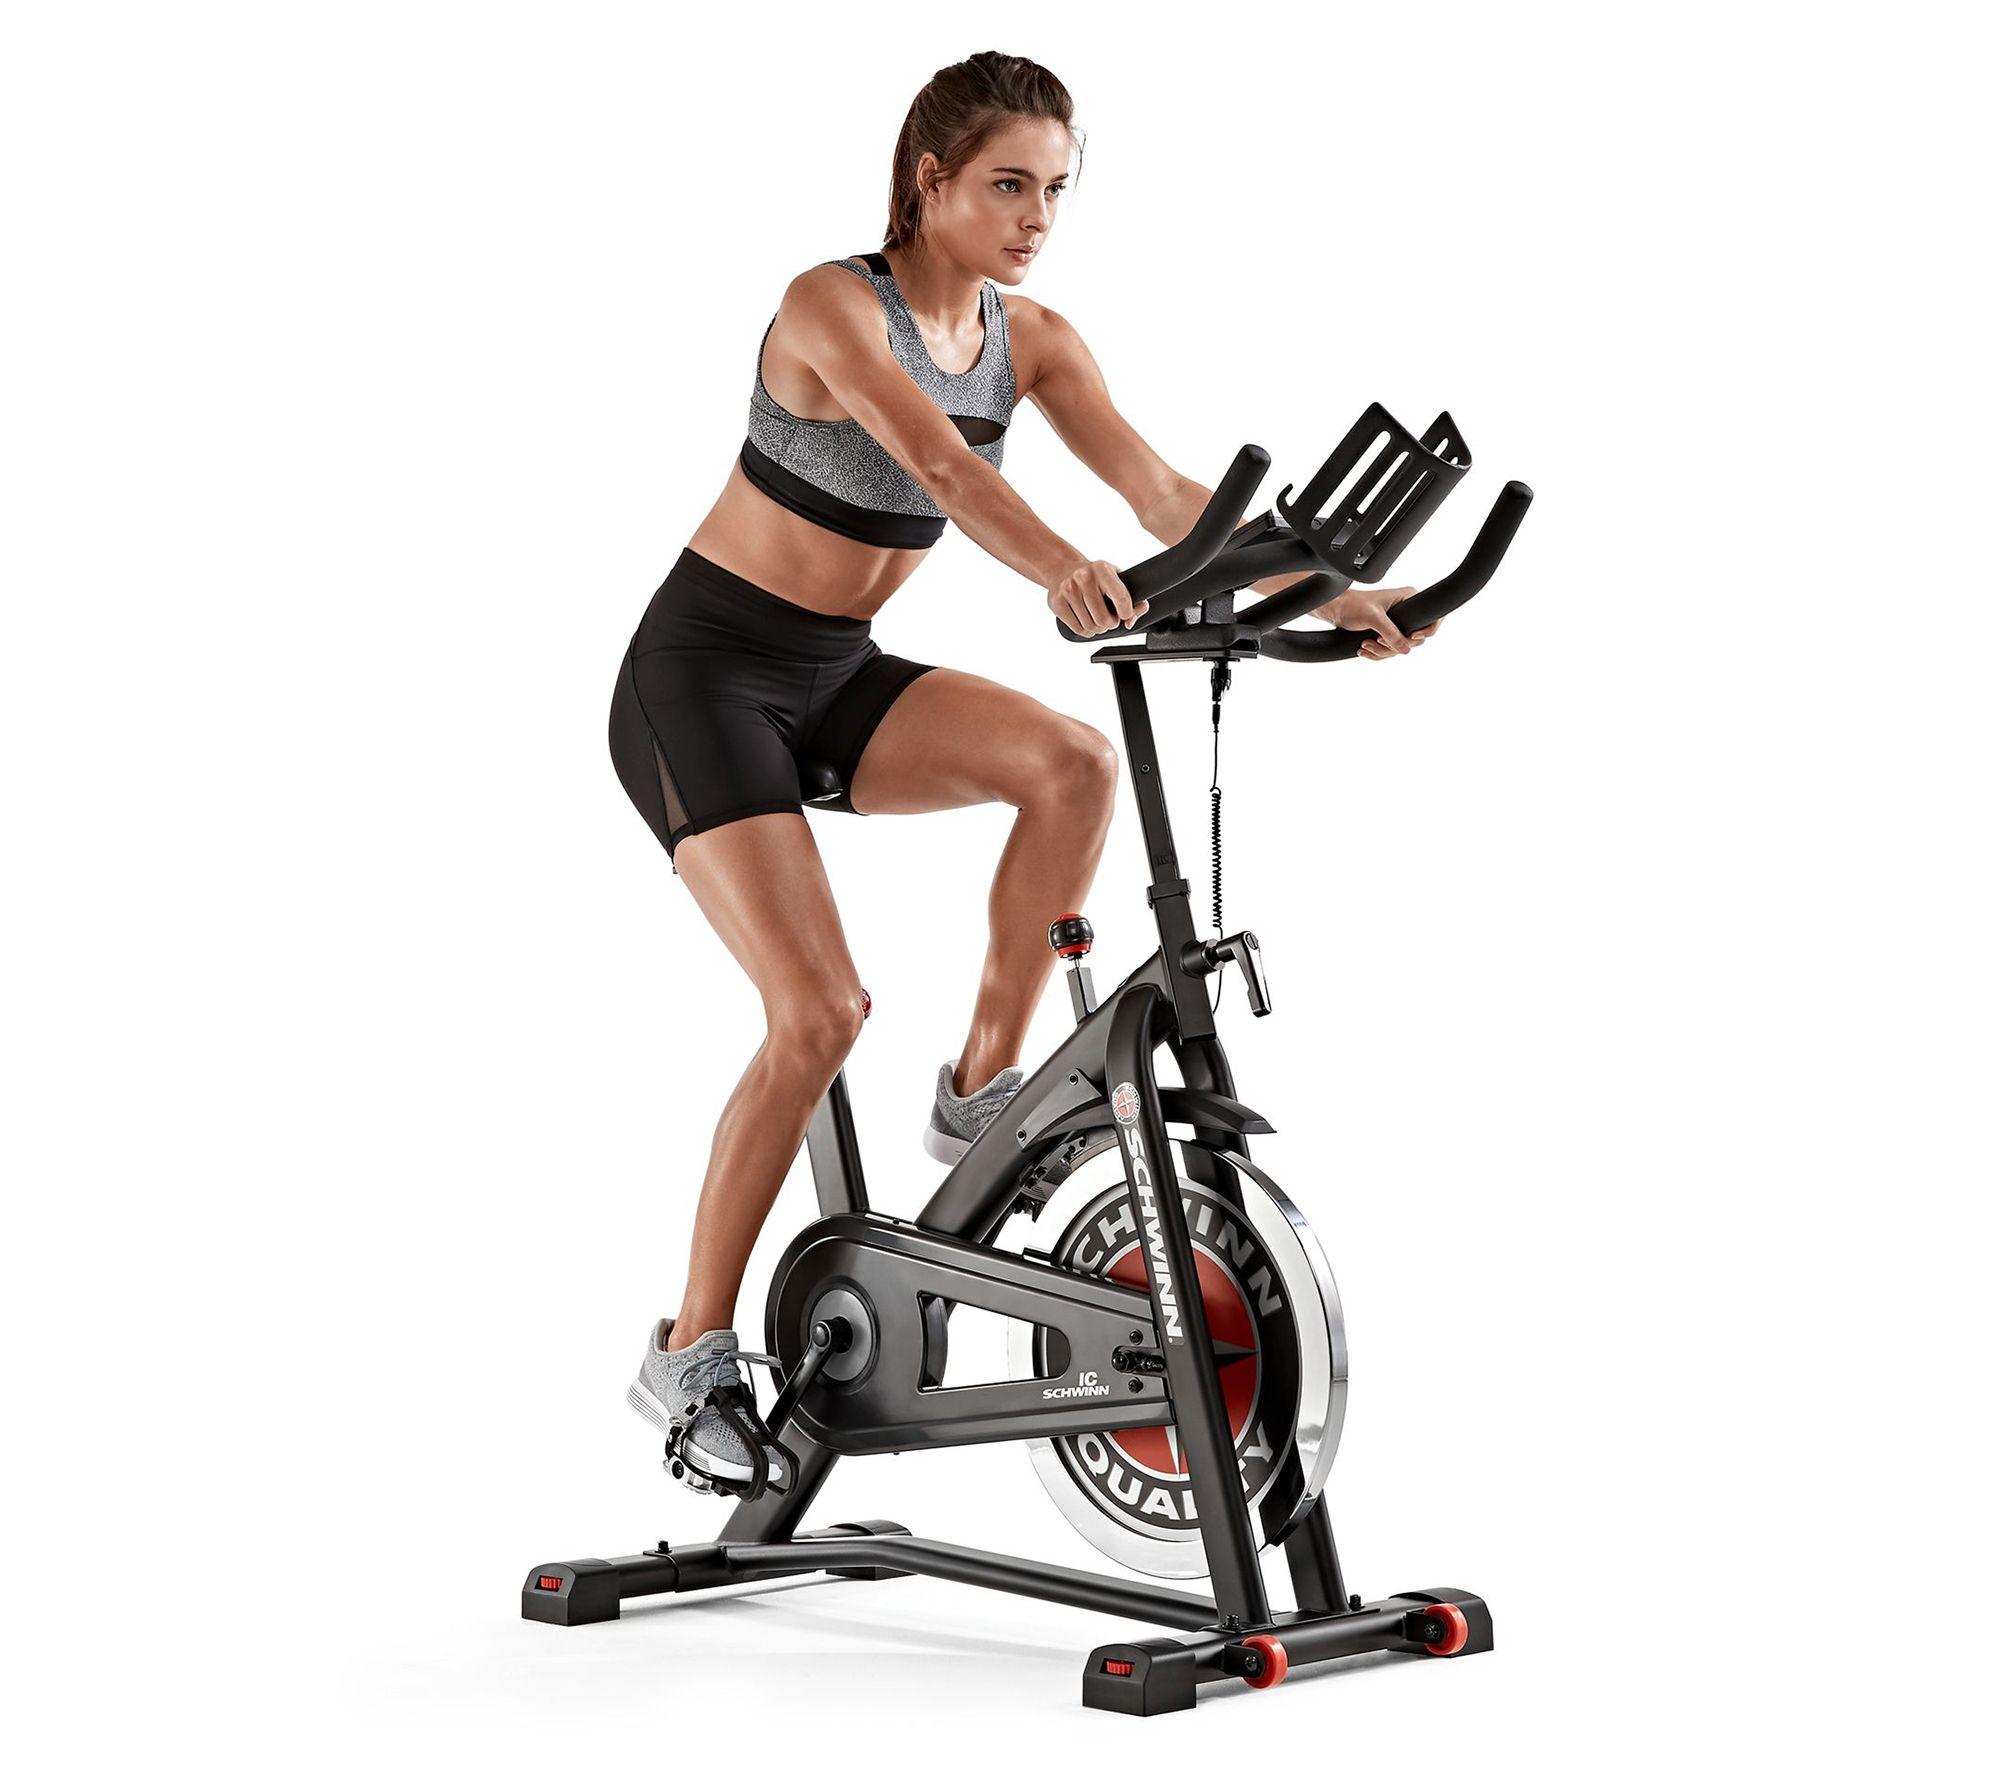 Schwinn Ic3 Indoor Cycling Bike Qvc Com